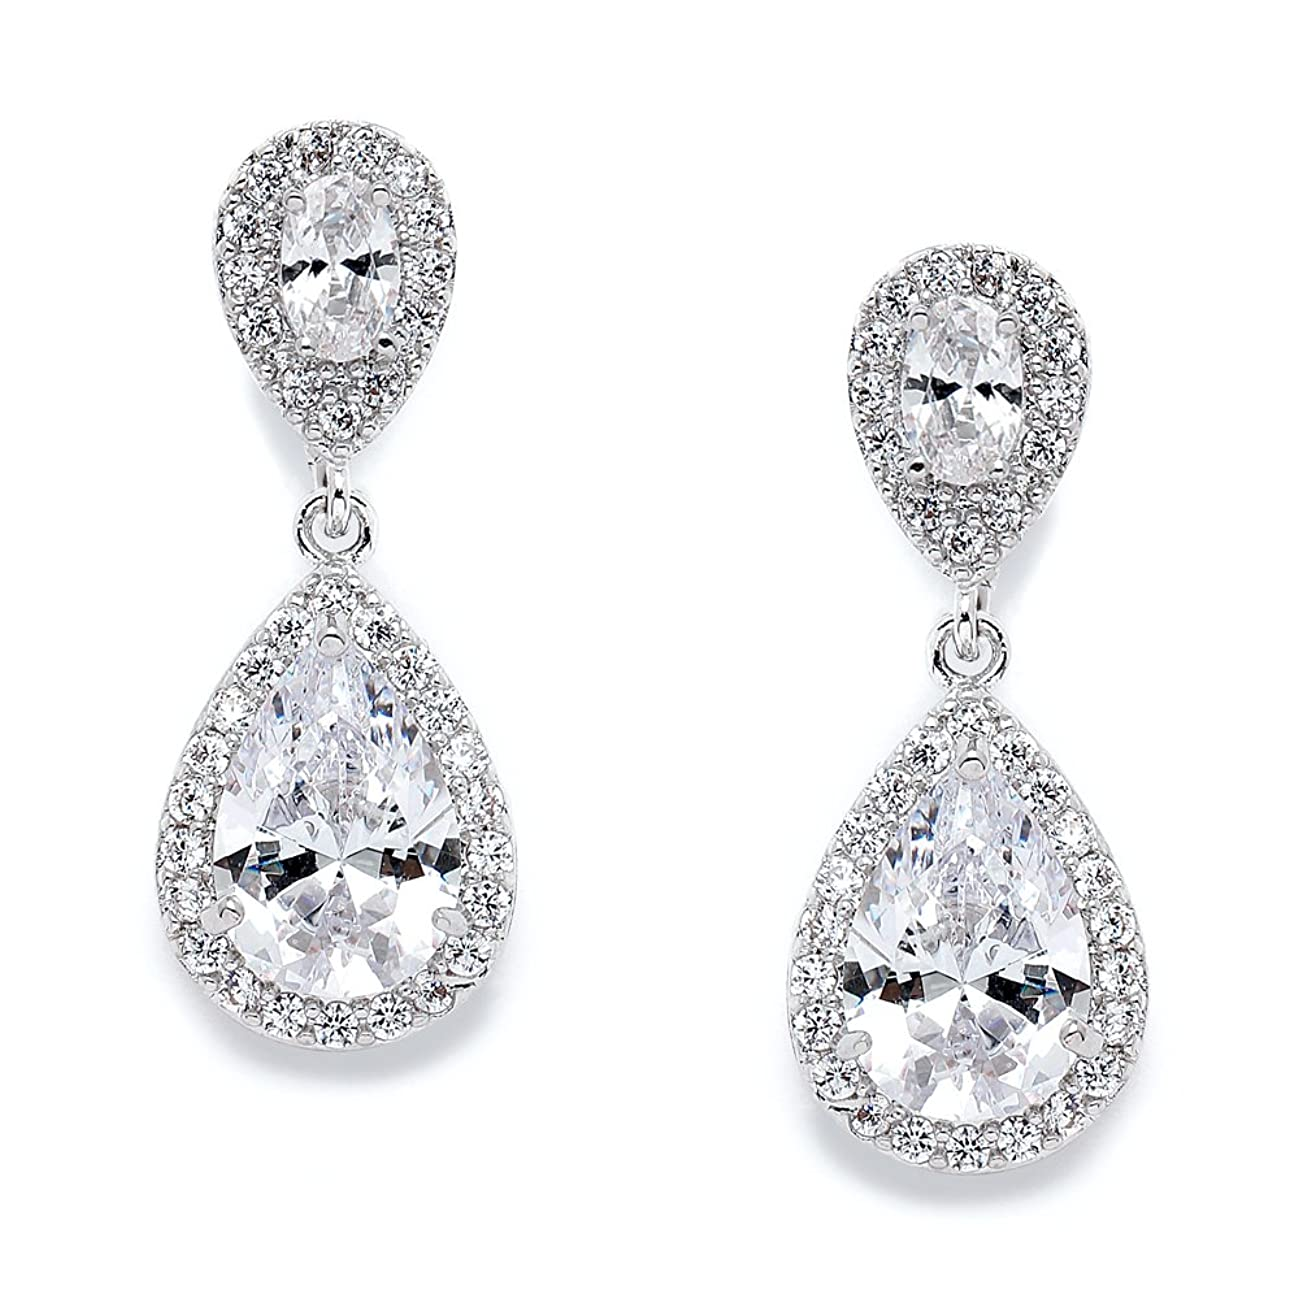 Mariell CZ Teardrop Clip On Wedding Earrings, Dainty Pear-Shaped Cubic Zirconia Dangle Clip-On for Brides